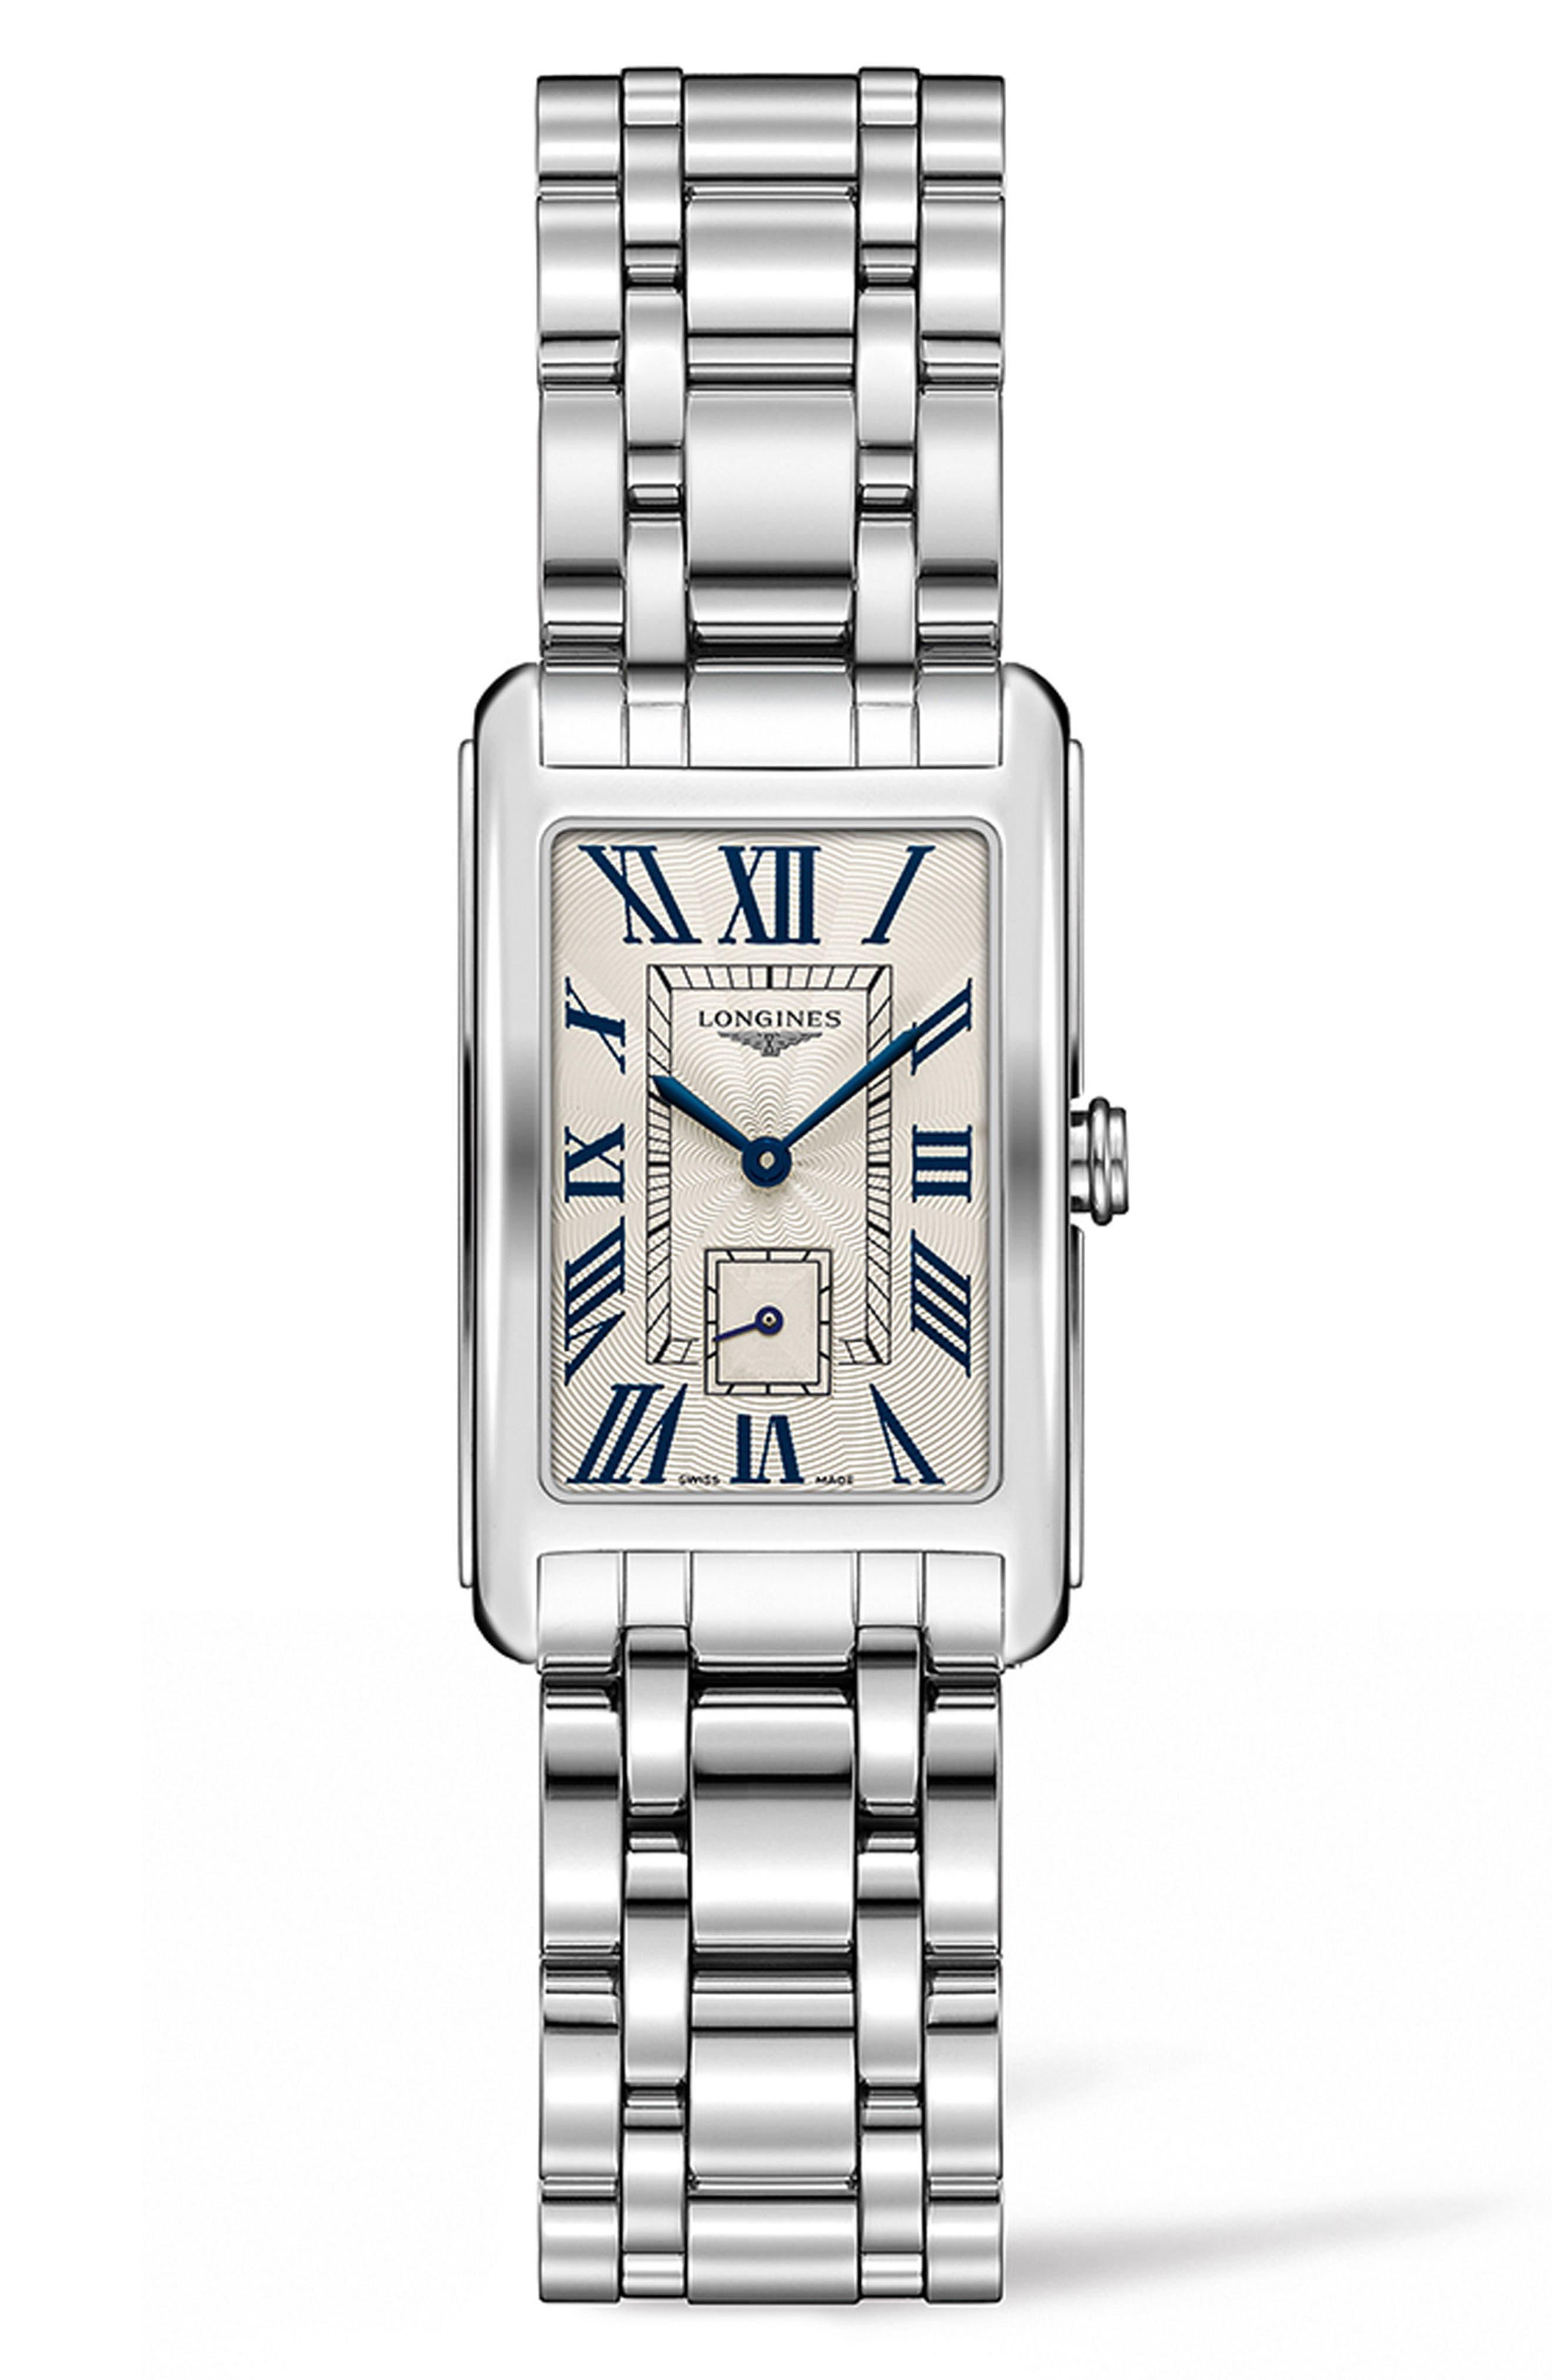 Main Image - Longines DolceVita Bracelet Watch, 23mm x 37mm